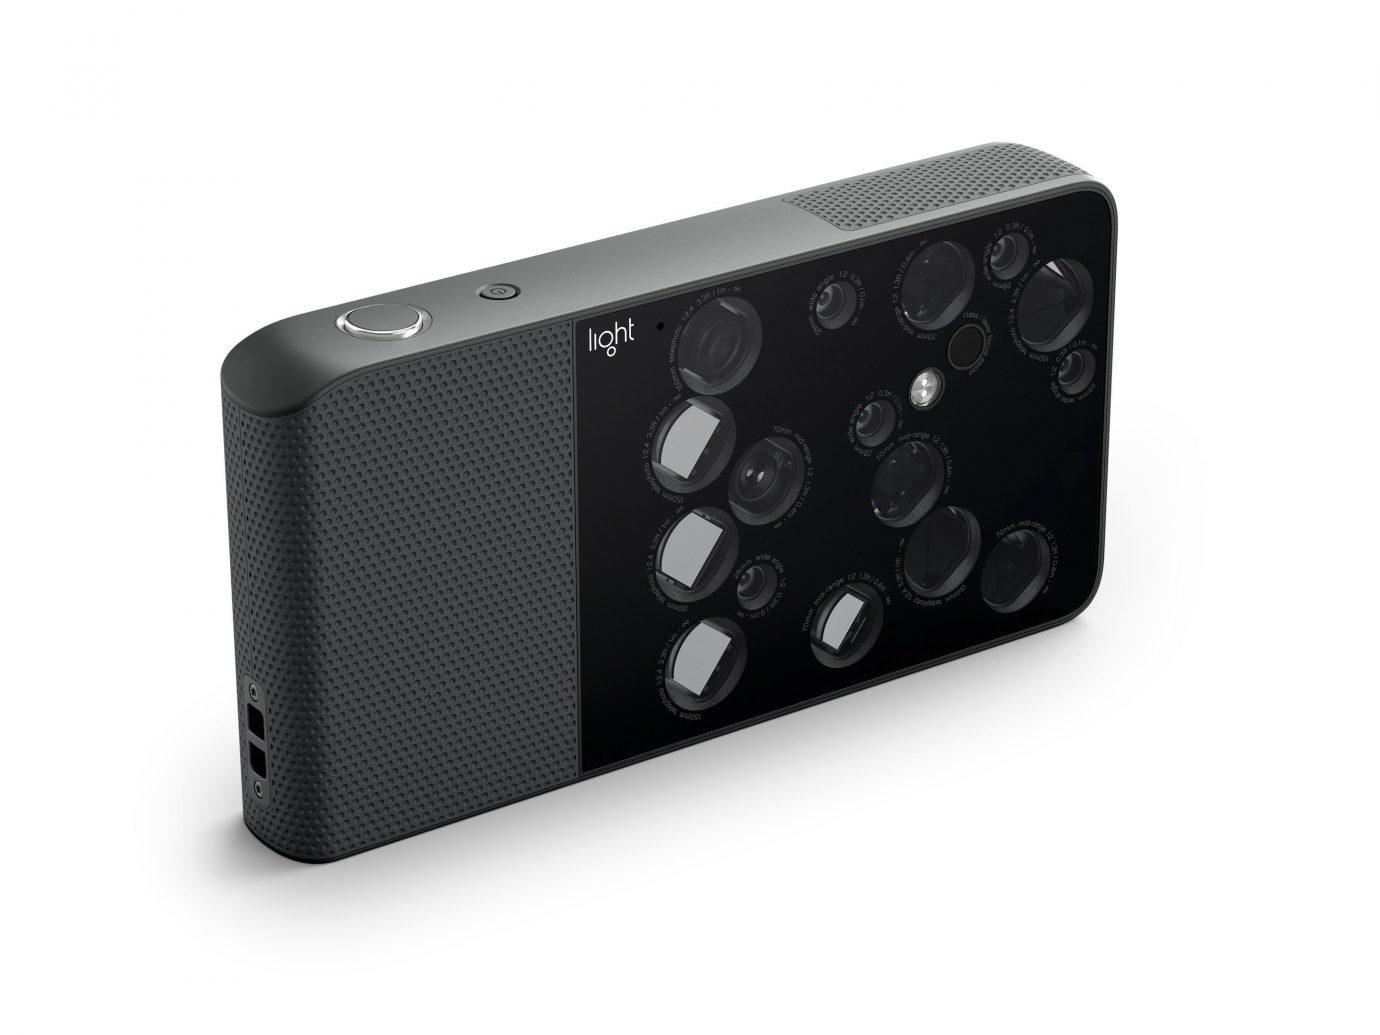 News Travel Shop Travel Tech electronics hardware product design product gadget electronic instrument multimedia